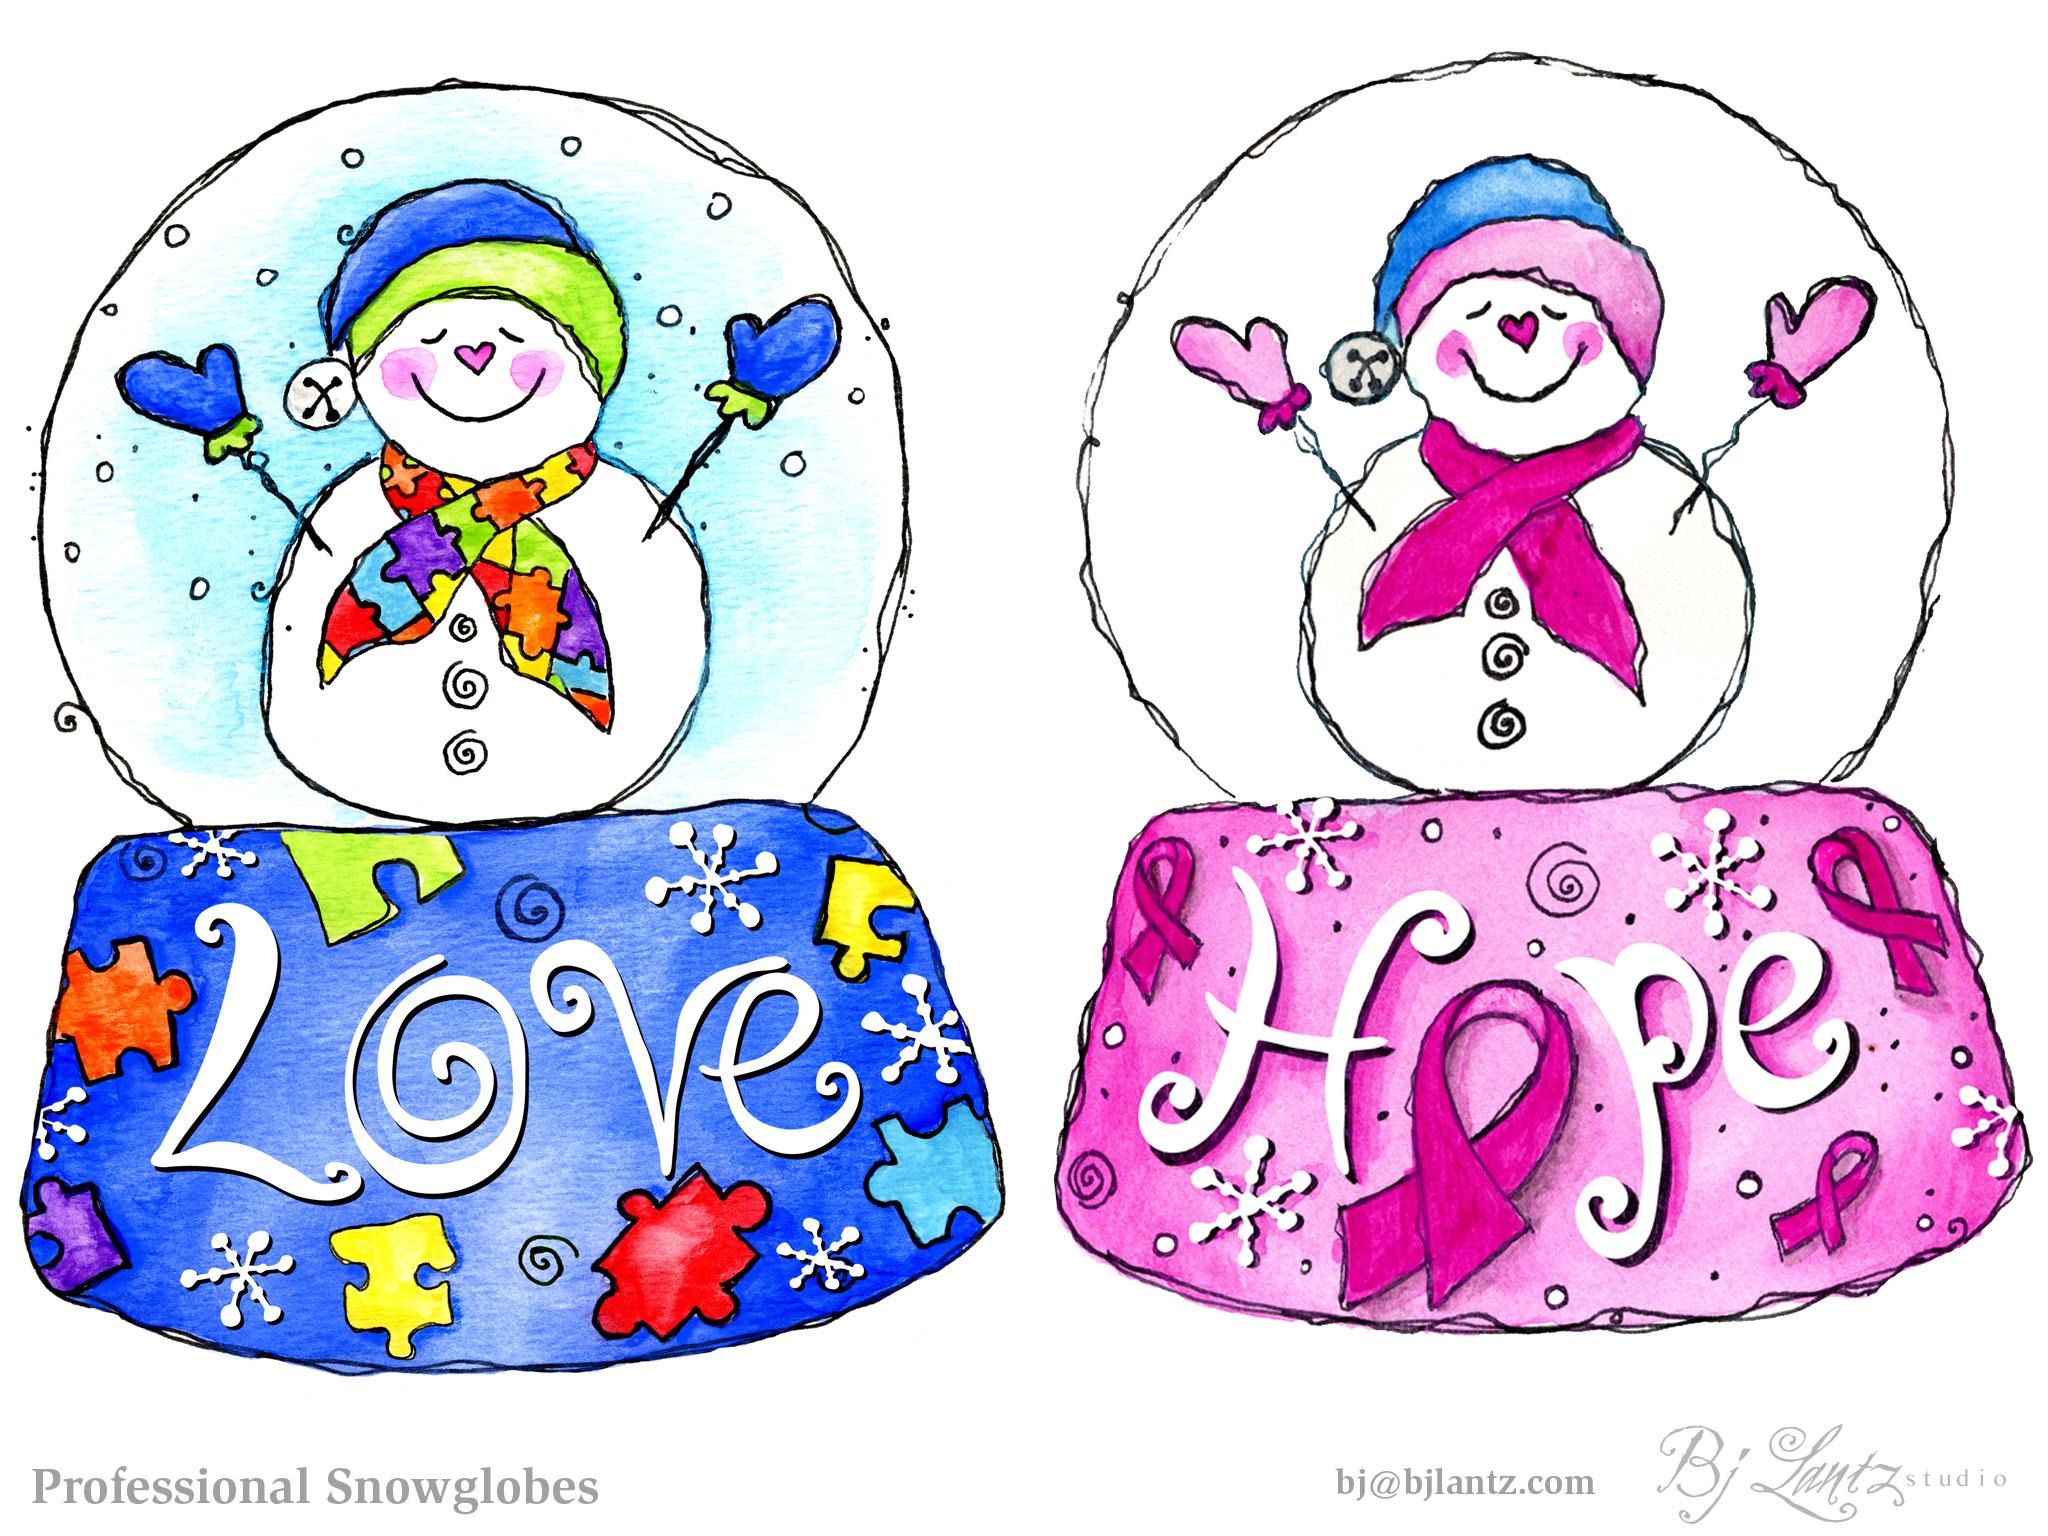 Snowglobes_pros_portfolio_4.jpg